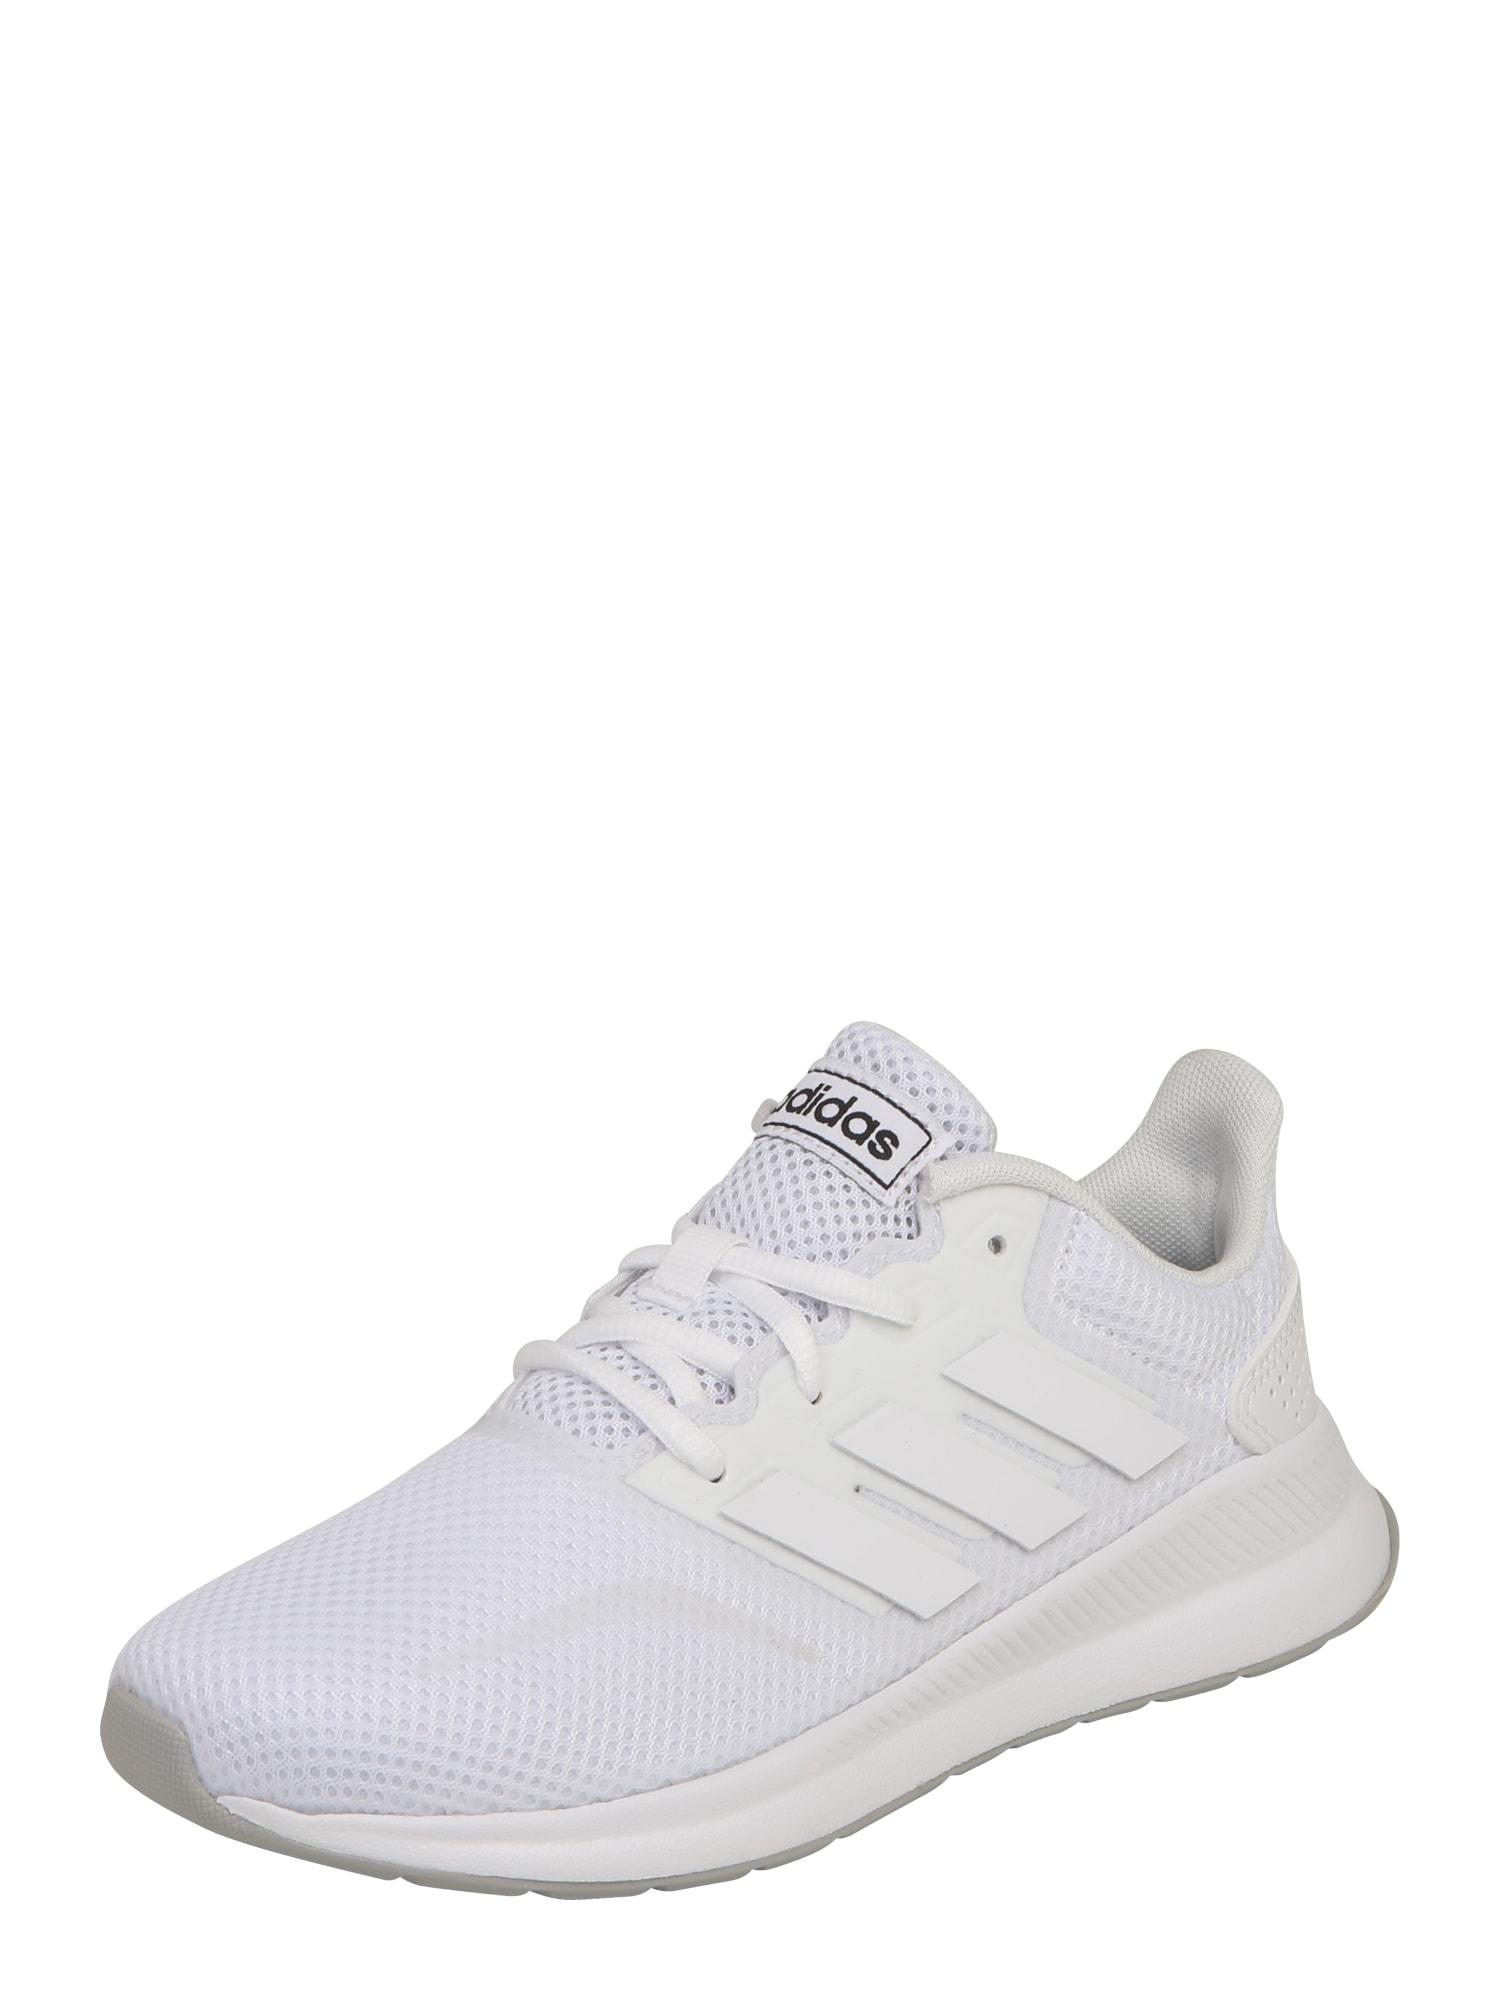 Sportovní boty RUNFALCON K bílá ADIDAS PERFORMANCE